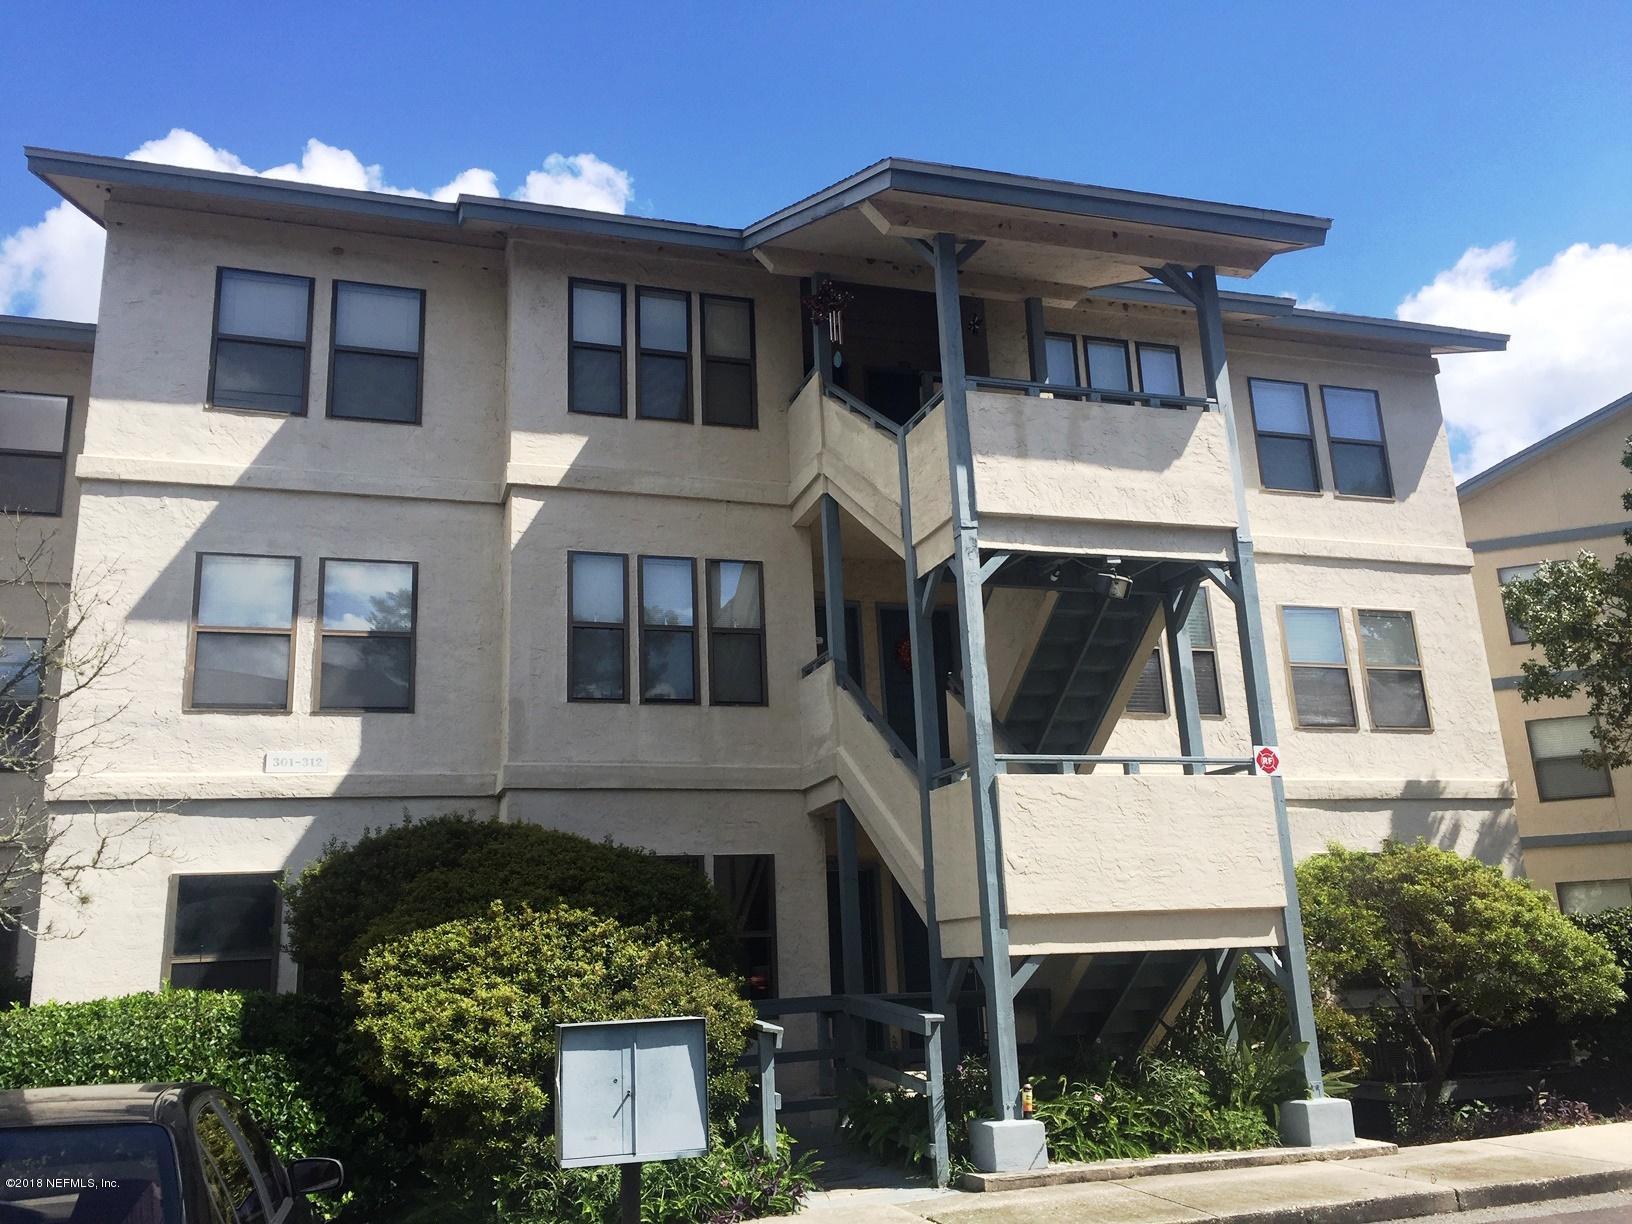 5615 SAN JUAN, JACKSONVILLE, FLORIDA 32210, 2 Bedrooms Bedrooms, ,2 BathroomsBathrooms,Residential - condos/townhomes,For sale,SAN JUAN,960547